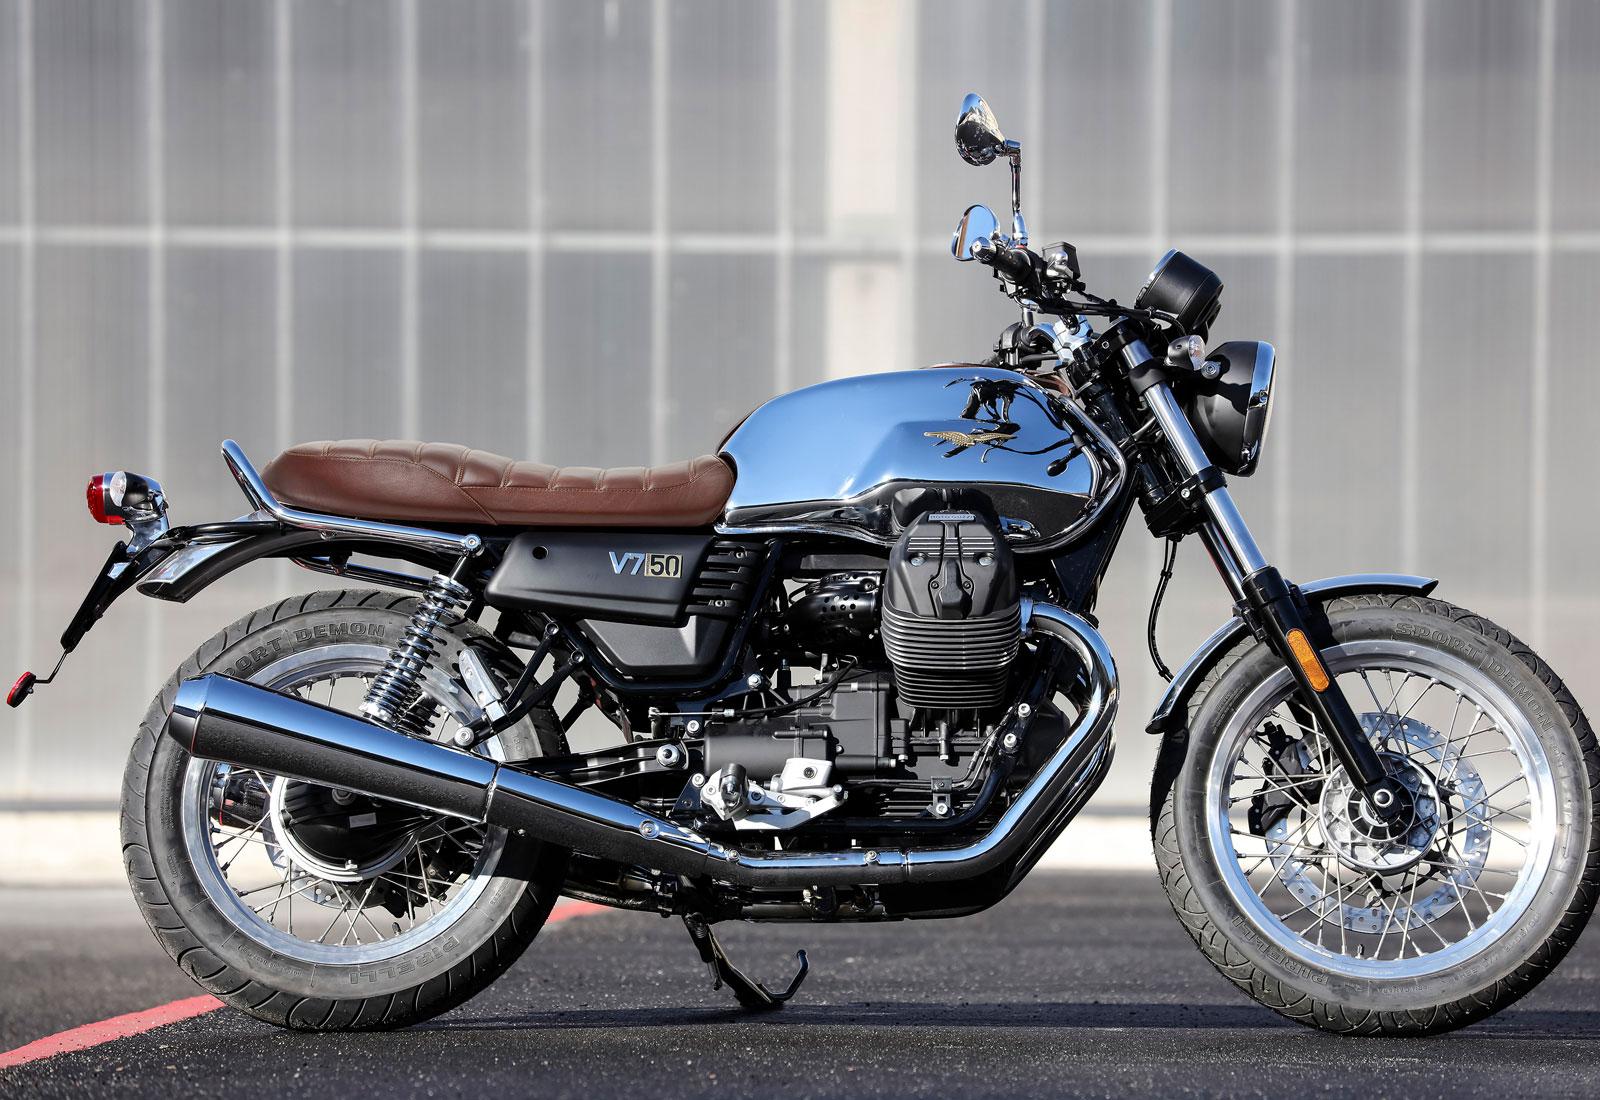 Moto modelo Anniversario. Marca Motoguzzi